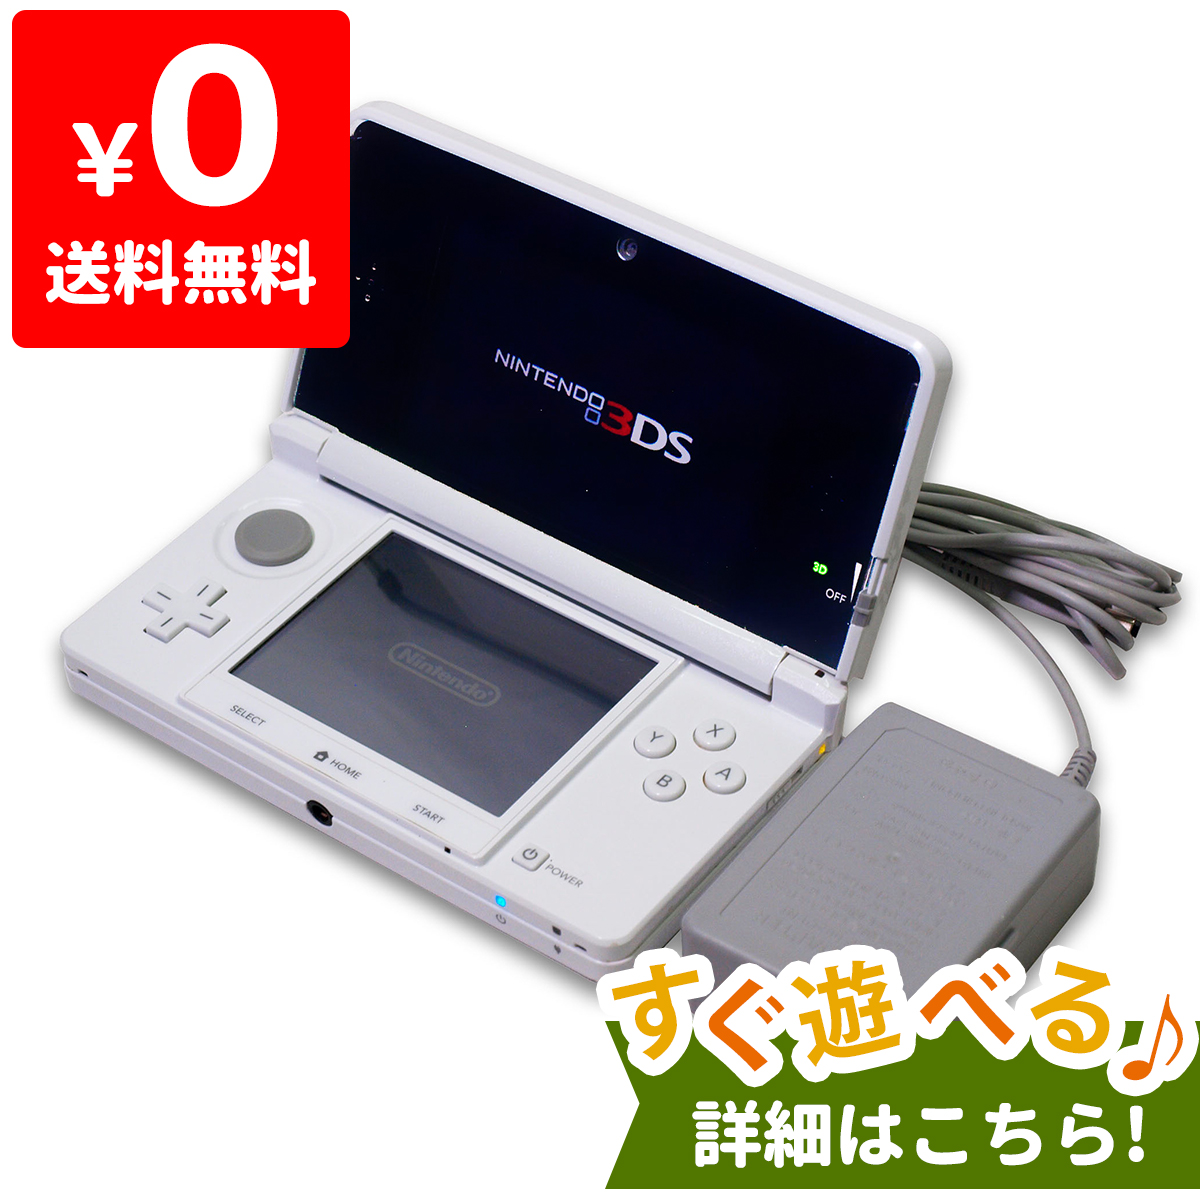 3DS ニンテンドー3DS ピュアホワイト 本体 すぐ遊べるセット Nintendo 任天堂 ニンテンドー 中古 4902370520798 送料無料 【中古】